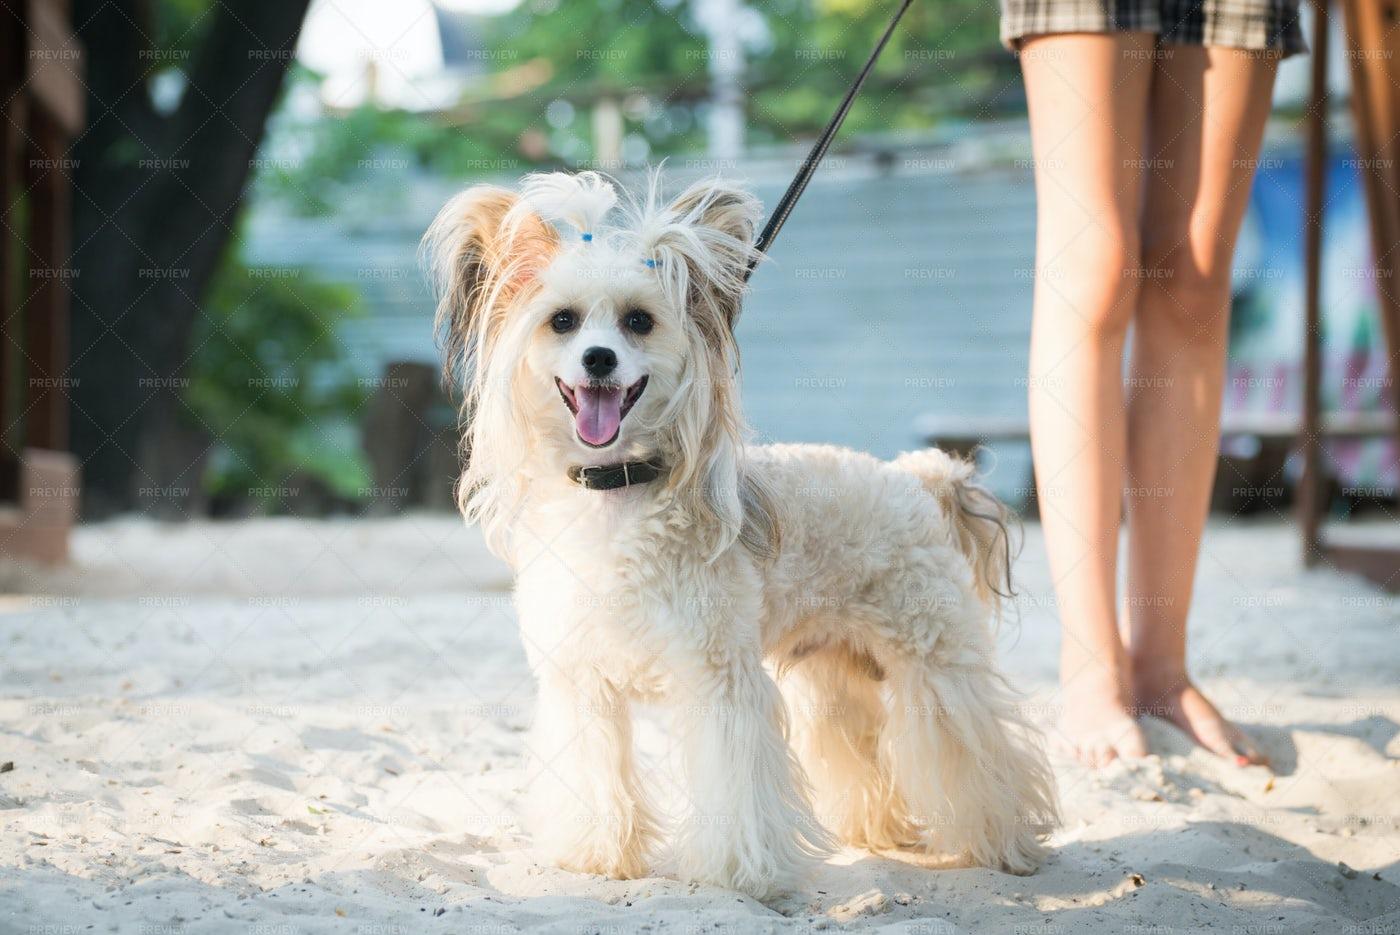 Dog At The Beach: Stock Photos